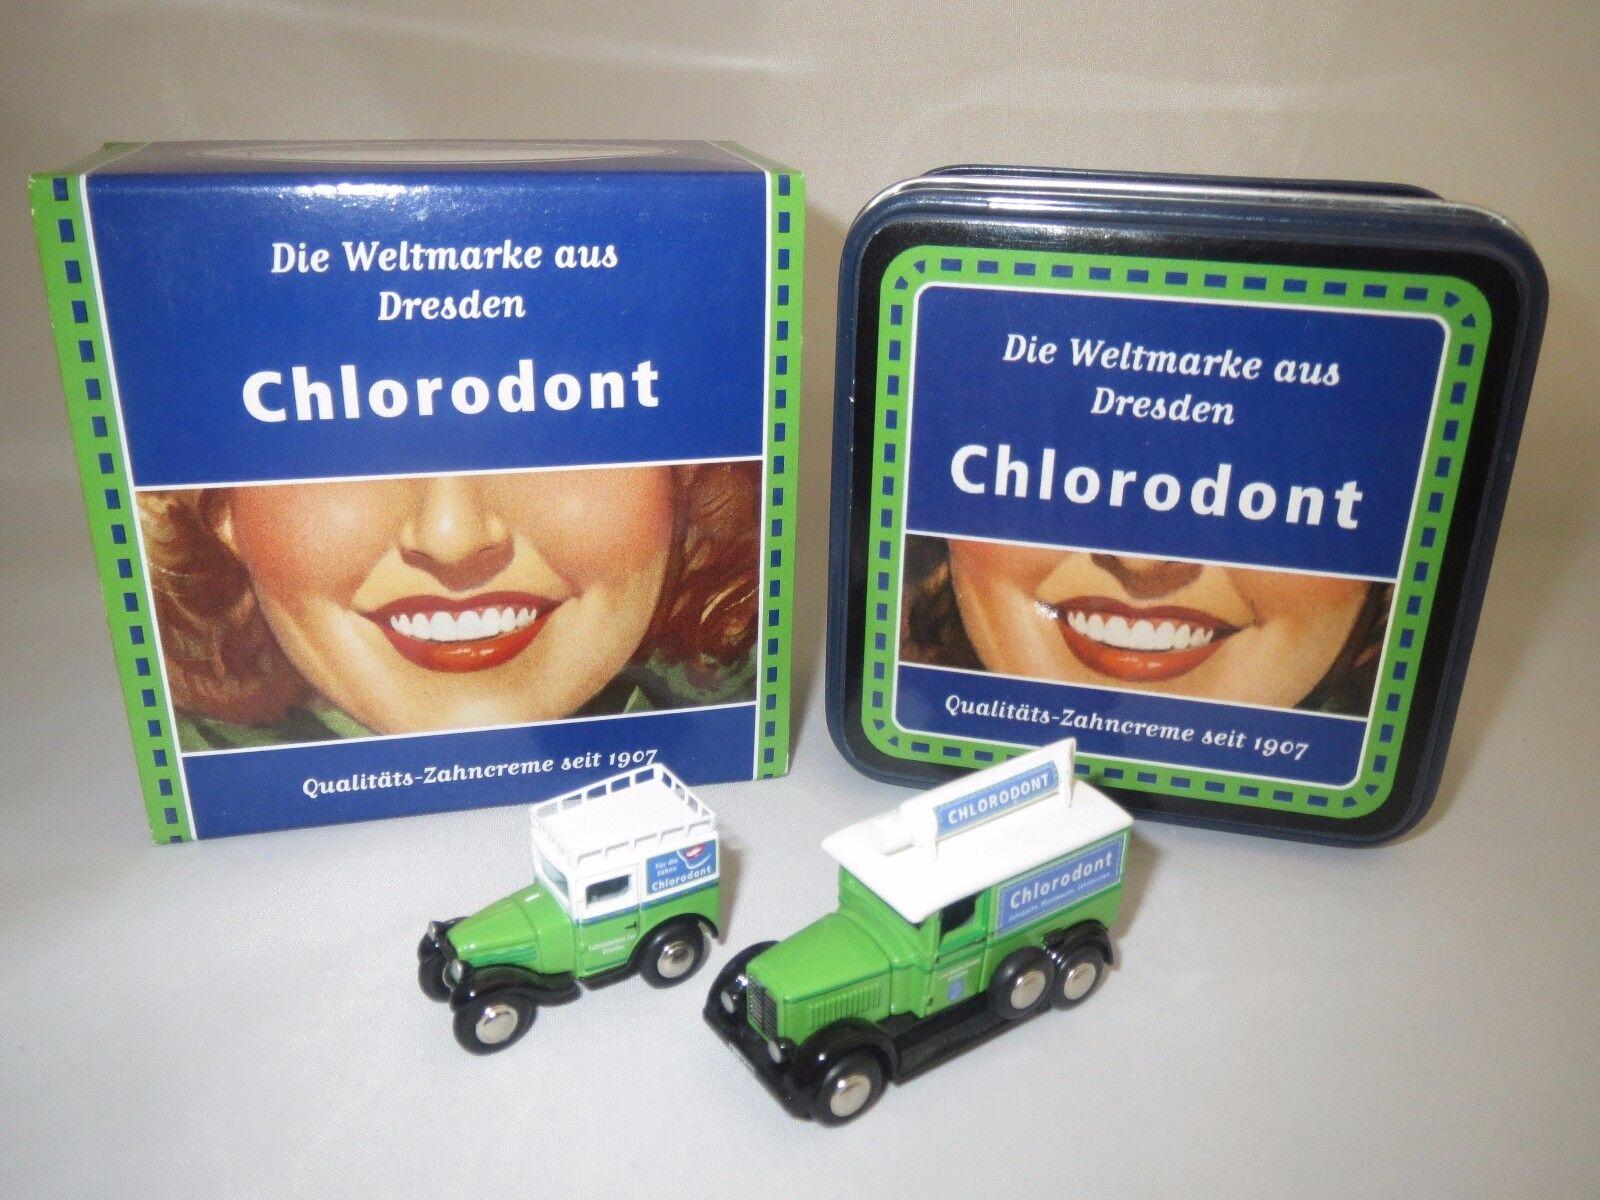 BUB  BMW  DIXI  &  Phänomen  Granit  (ChlGolddont)  1 87 OVP   (1)  | Export